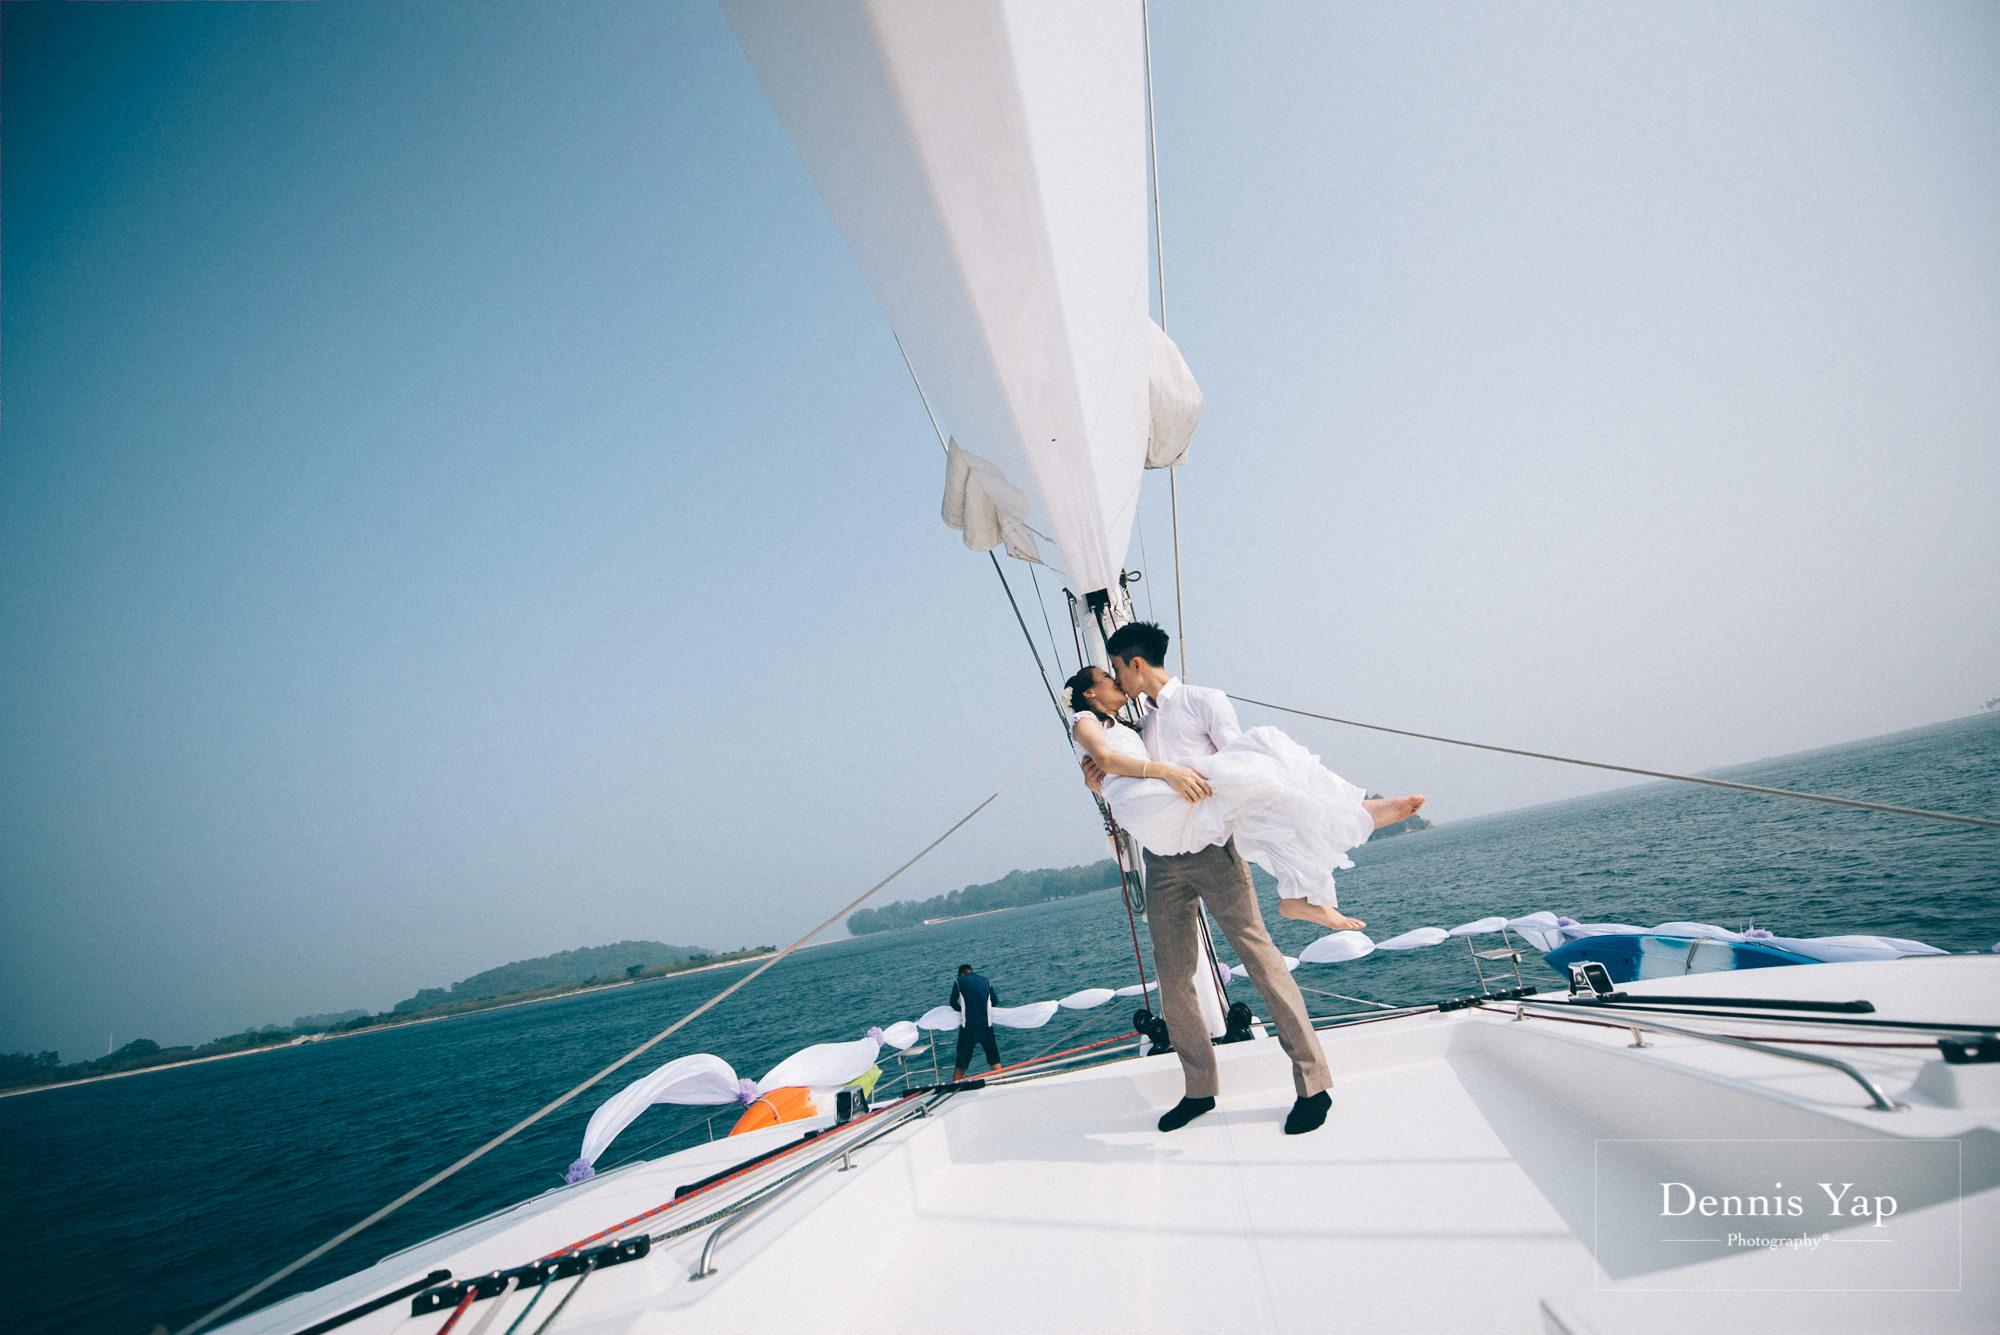 danny sherine wedding reception registration of marriage yacht fun beloved sea dennis yap photography malaysia top wedding photographer-26.jpg